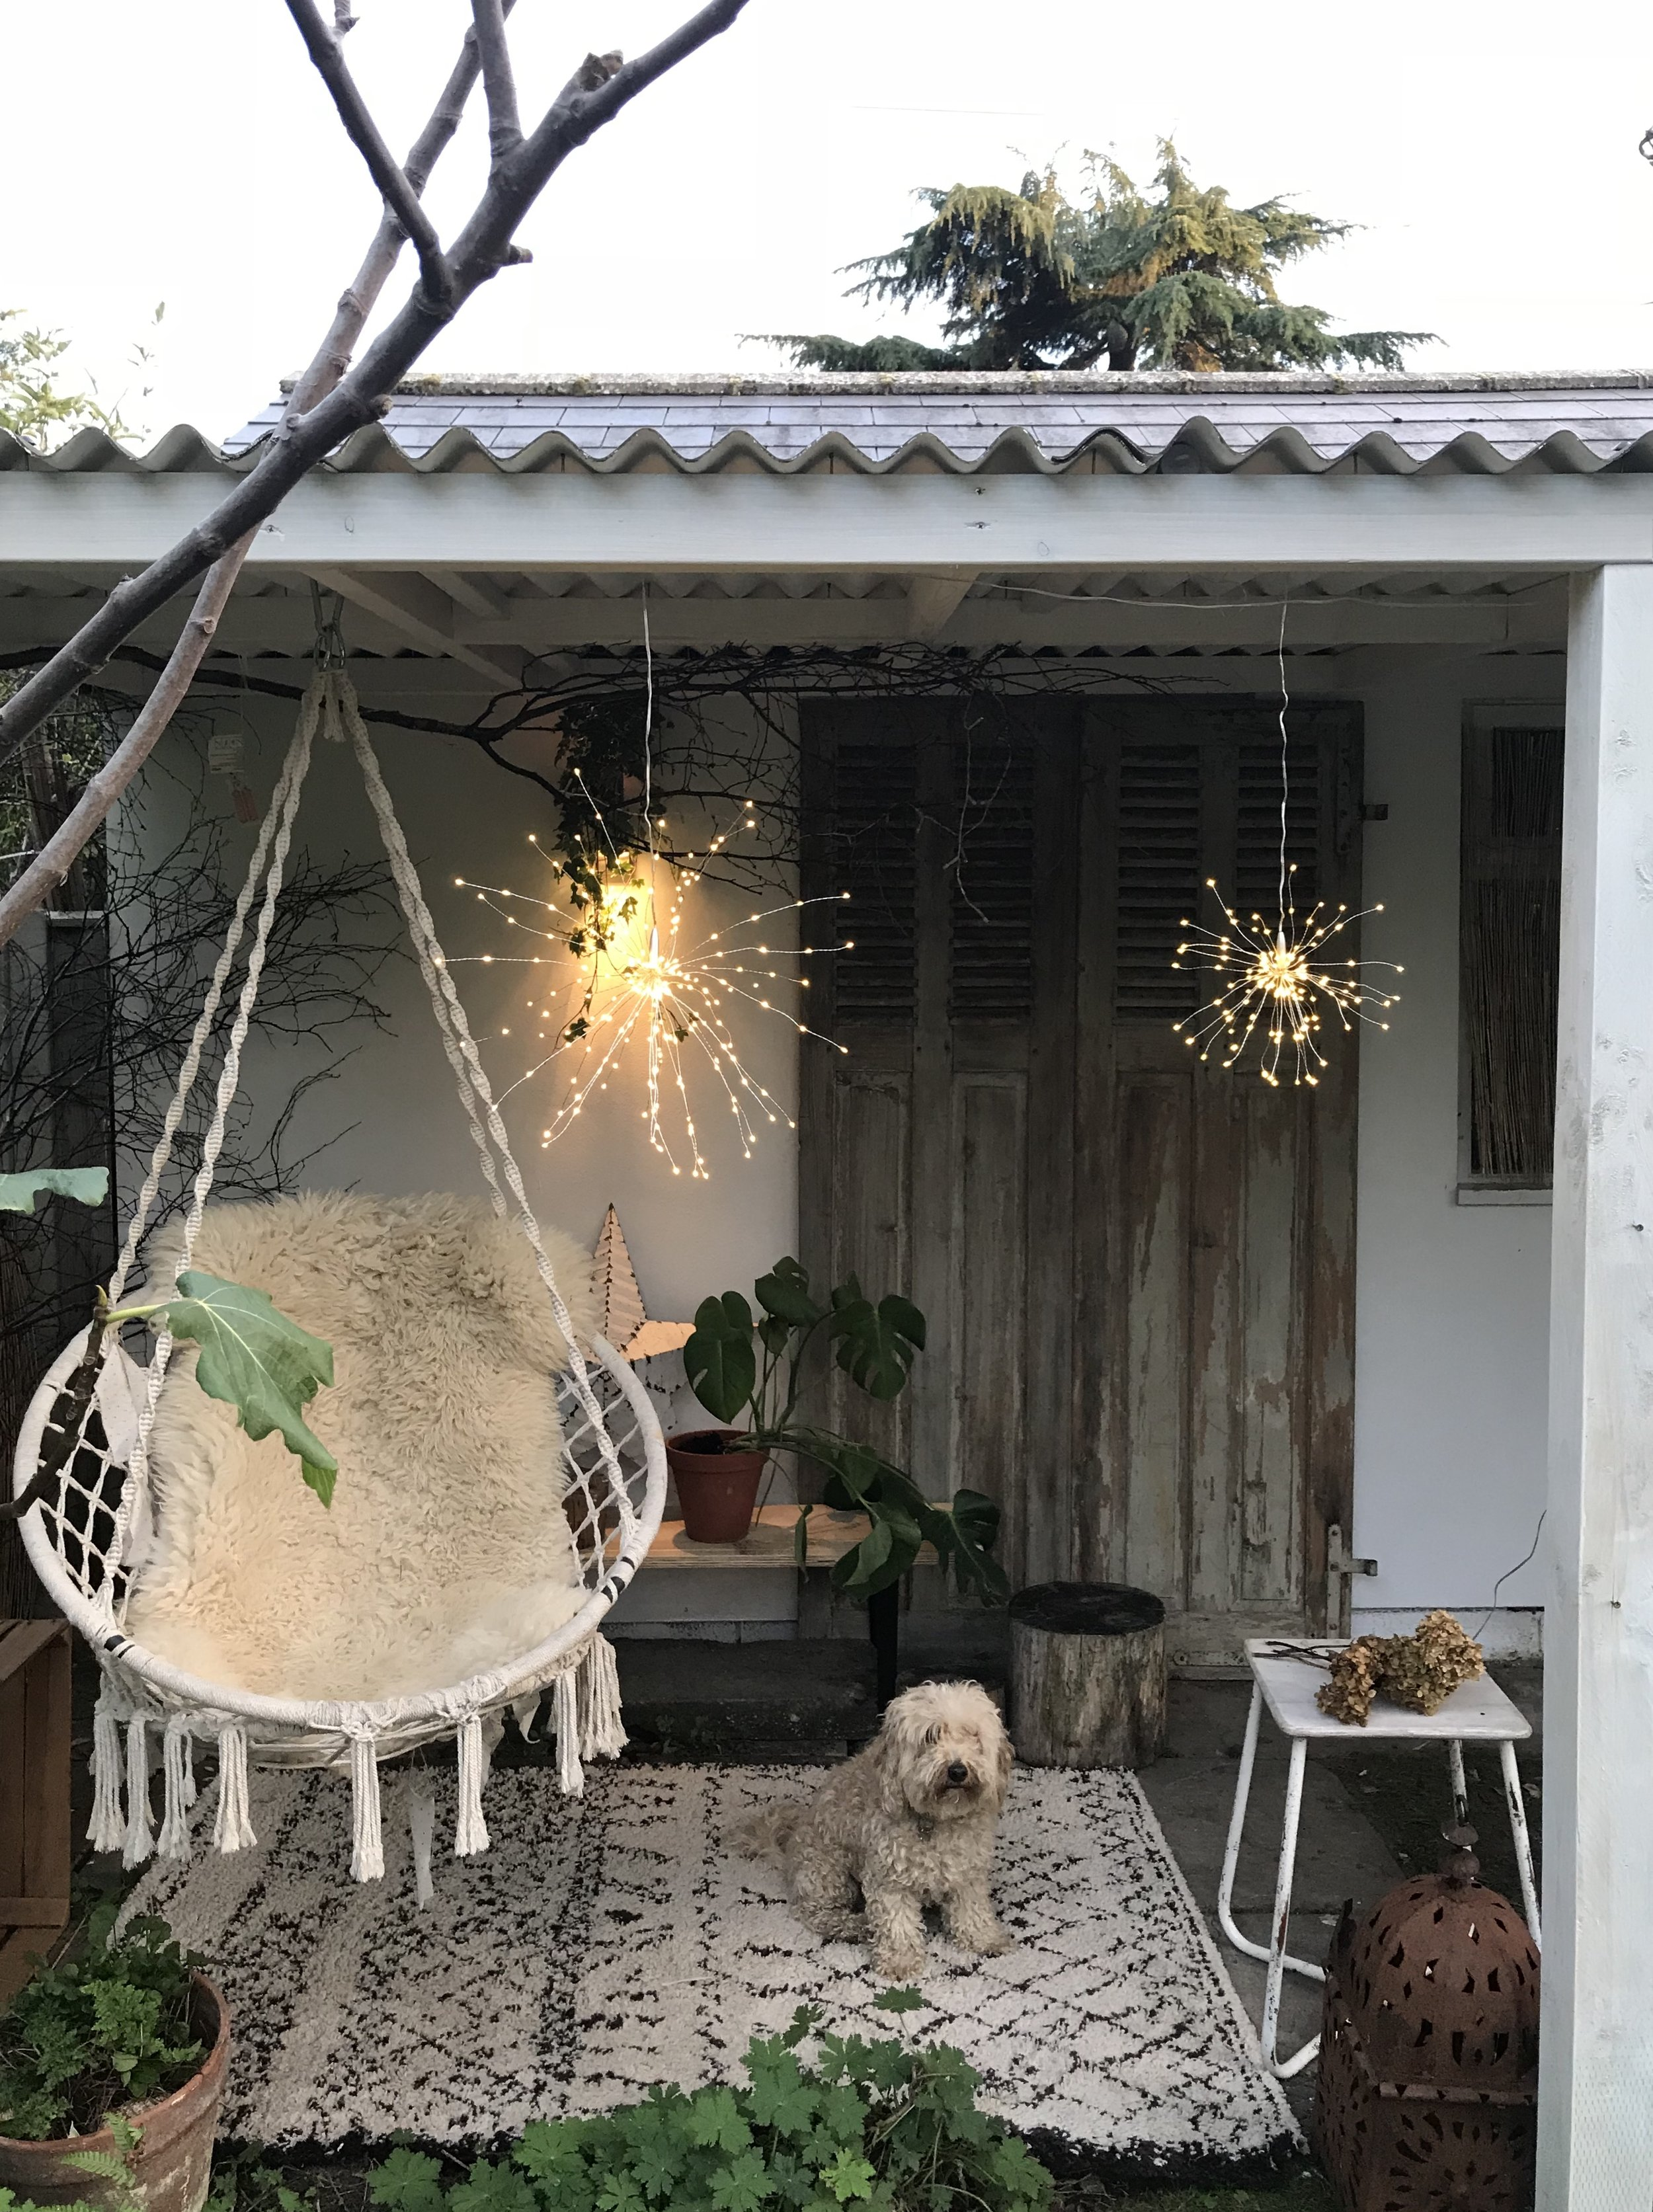 LED Starburst Lights in the beautiful outside room belonging to Dee Campling  @deecampling